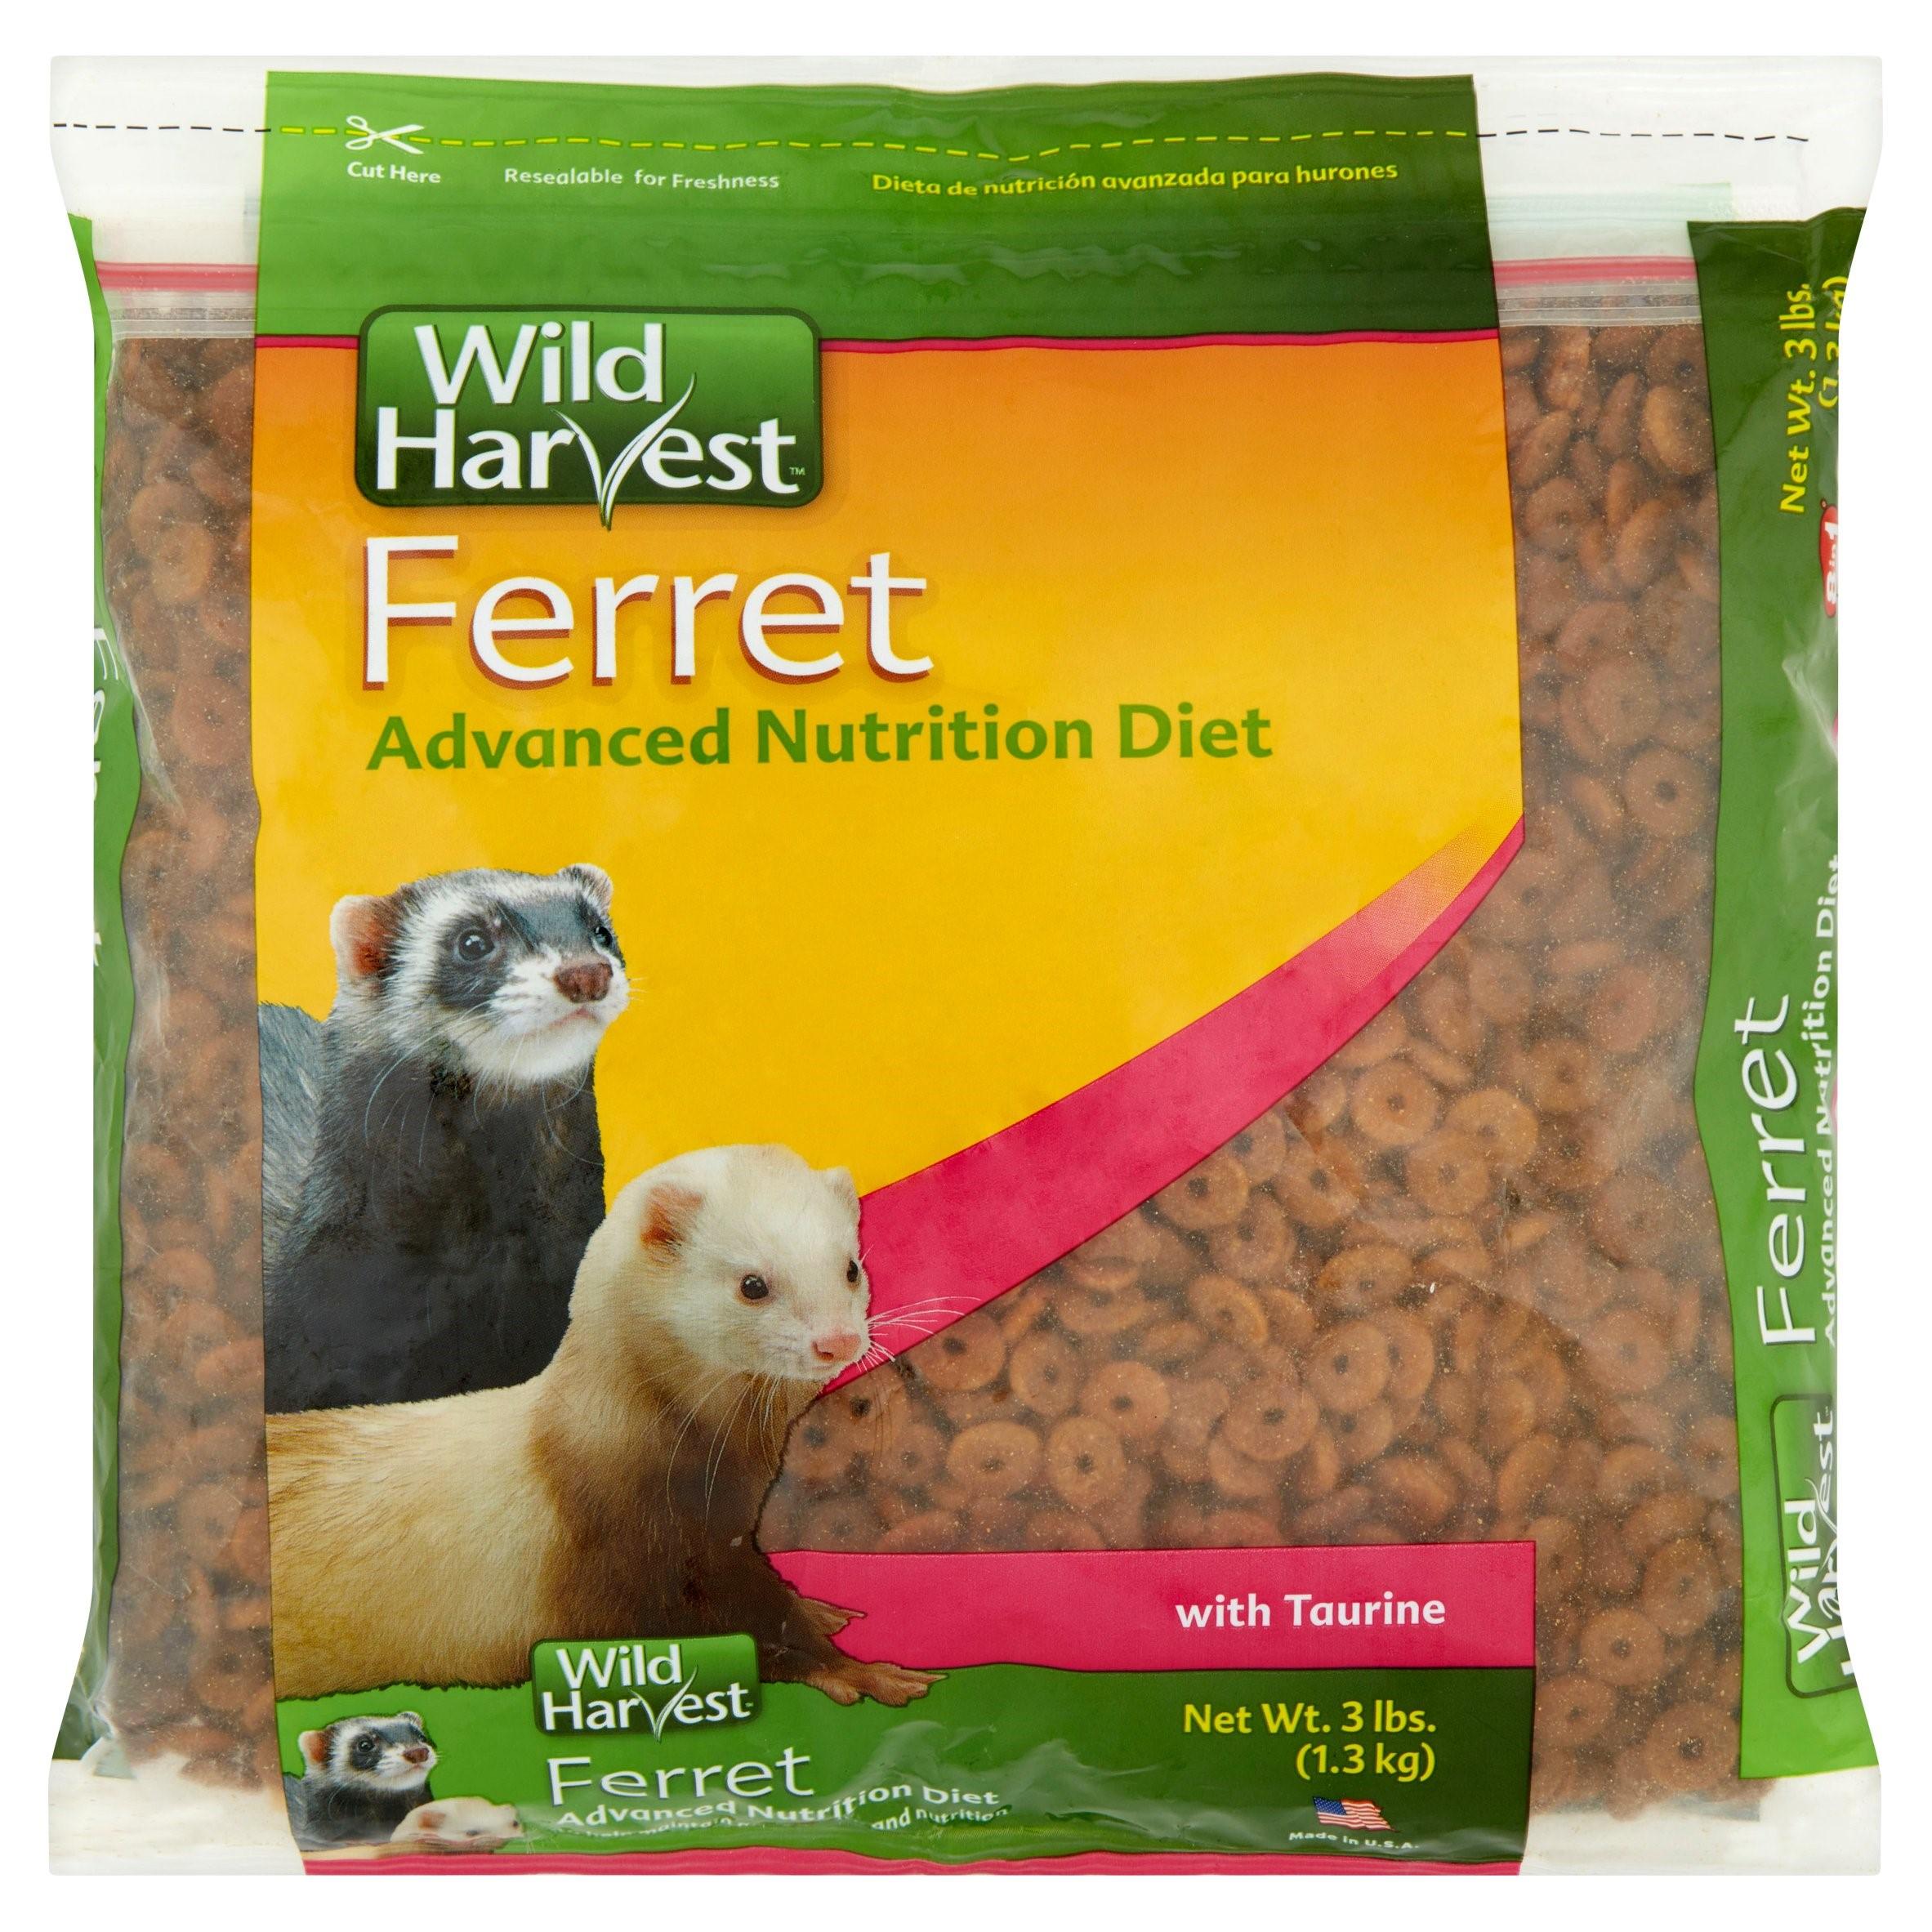 Wild Harvest Advanced Nutrition Diet Ferret Food, 3 lbs